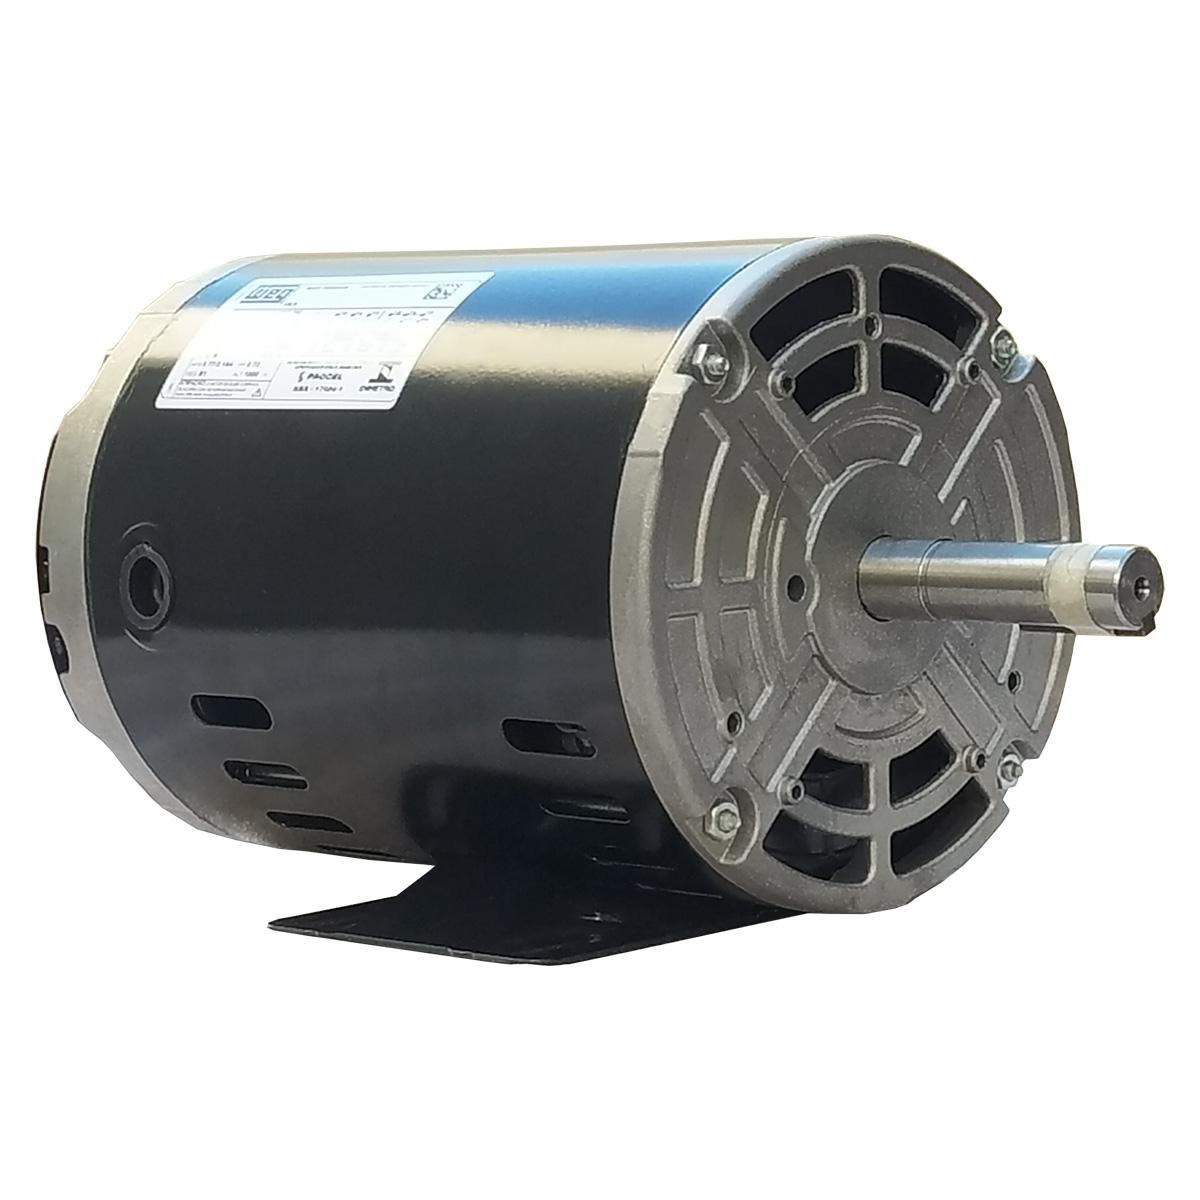 Motor Elétrico Trifásico 1CV 4 Polos Baixa Rotação 220/380v Aberto IP21 Weg IR3